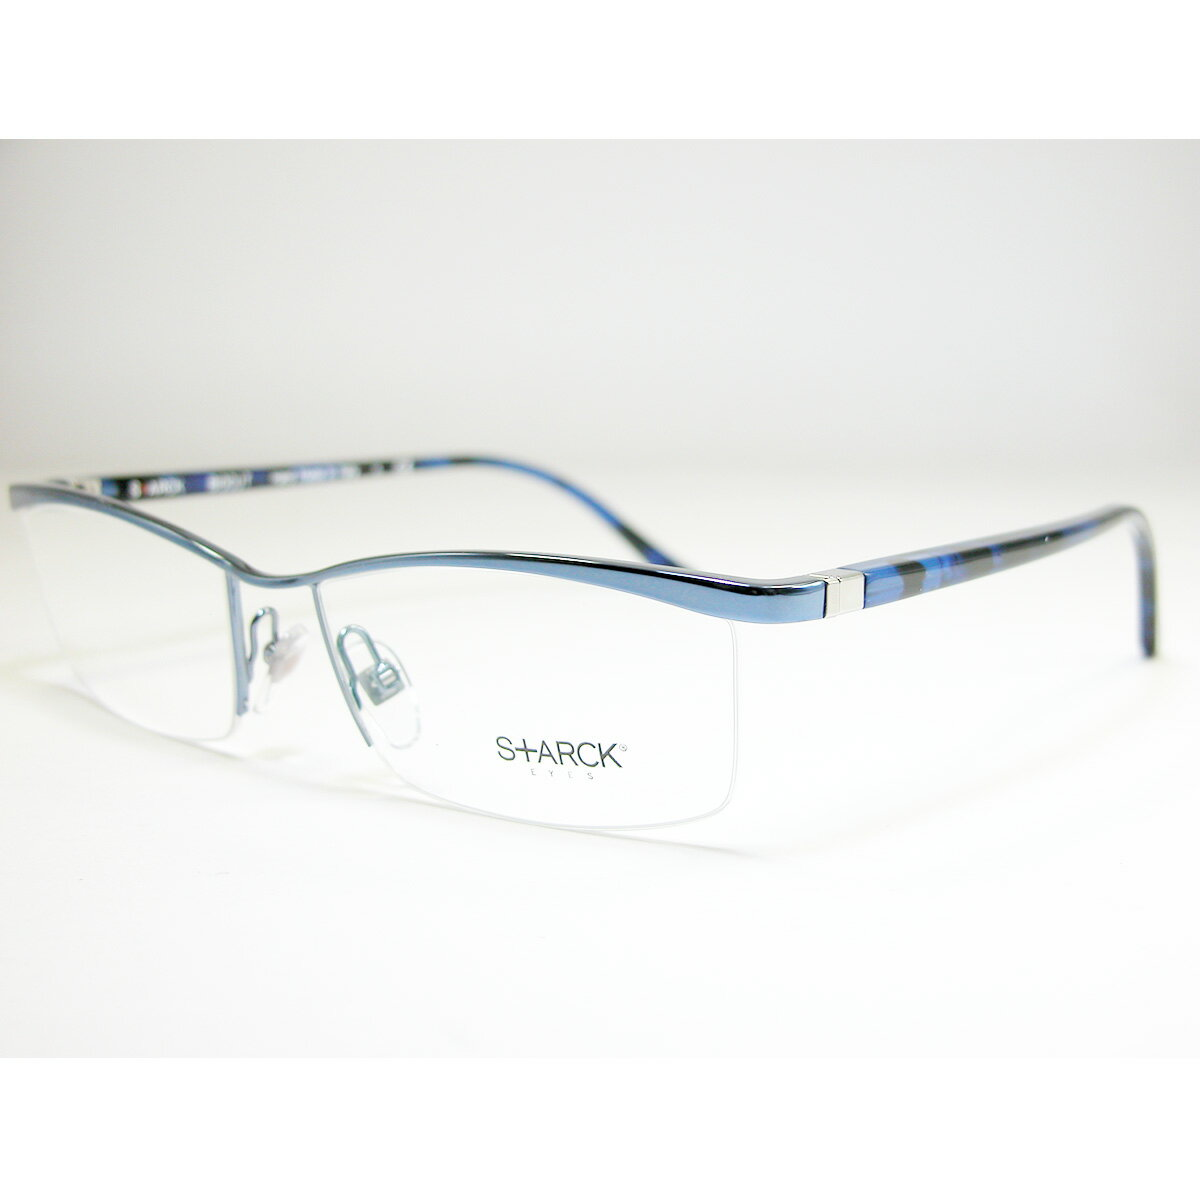 alain mikli アランミクリ メガネSTARCK EYES (スタルクアイズ) SH9901 カラー0057(正規品)【楽ギフ_包装】 メンズ メガネ サングラス 眼鏡